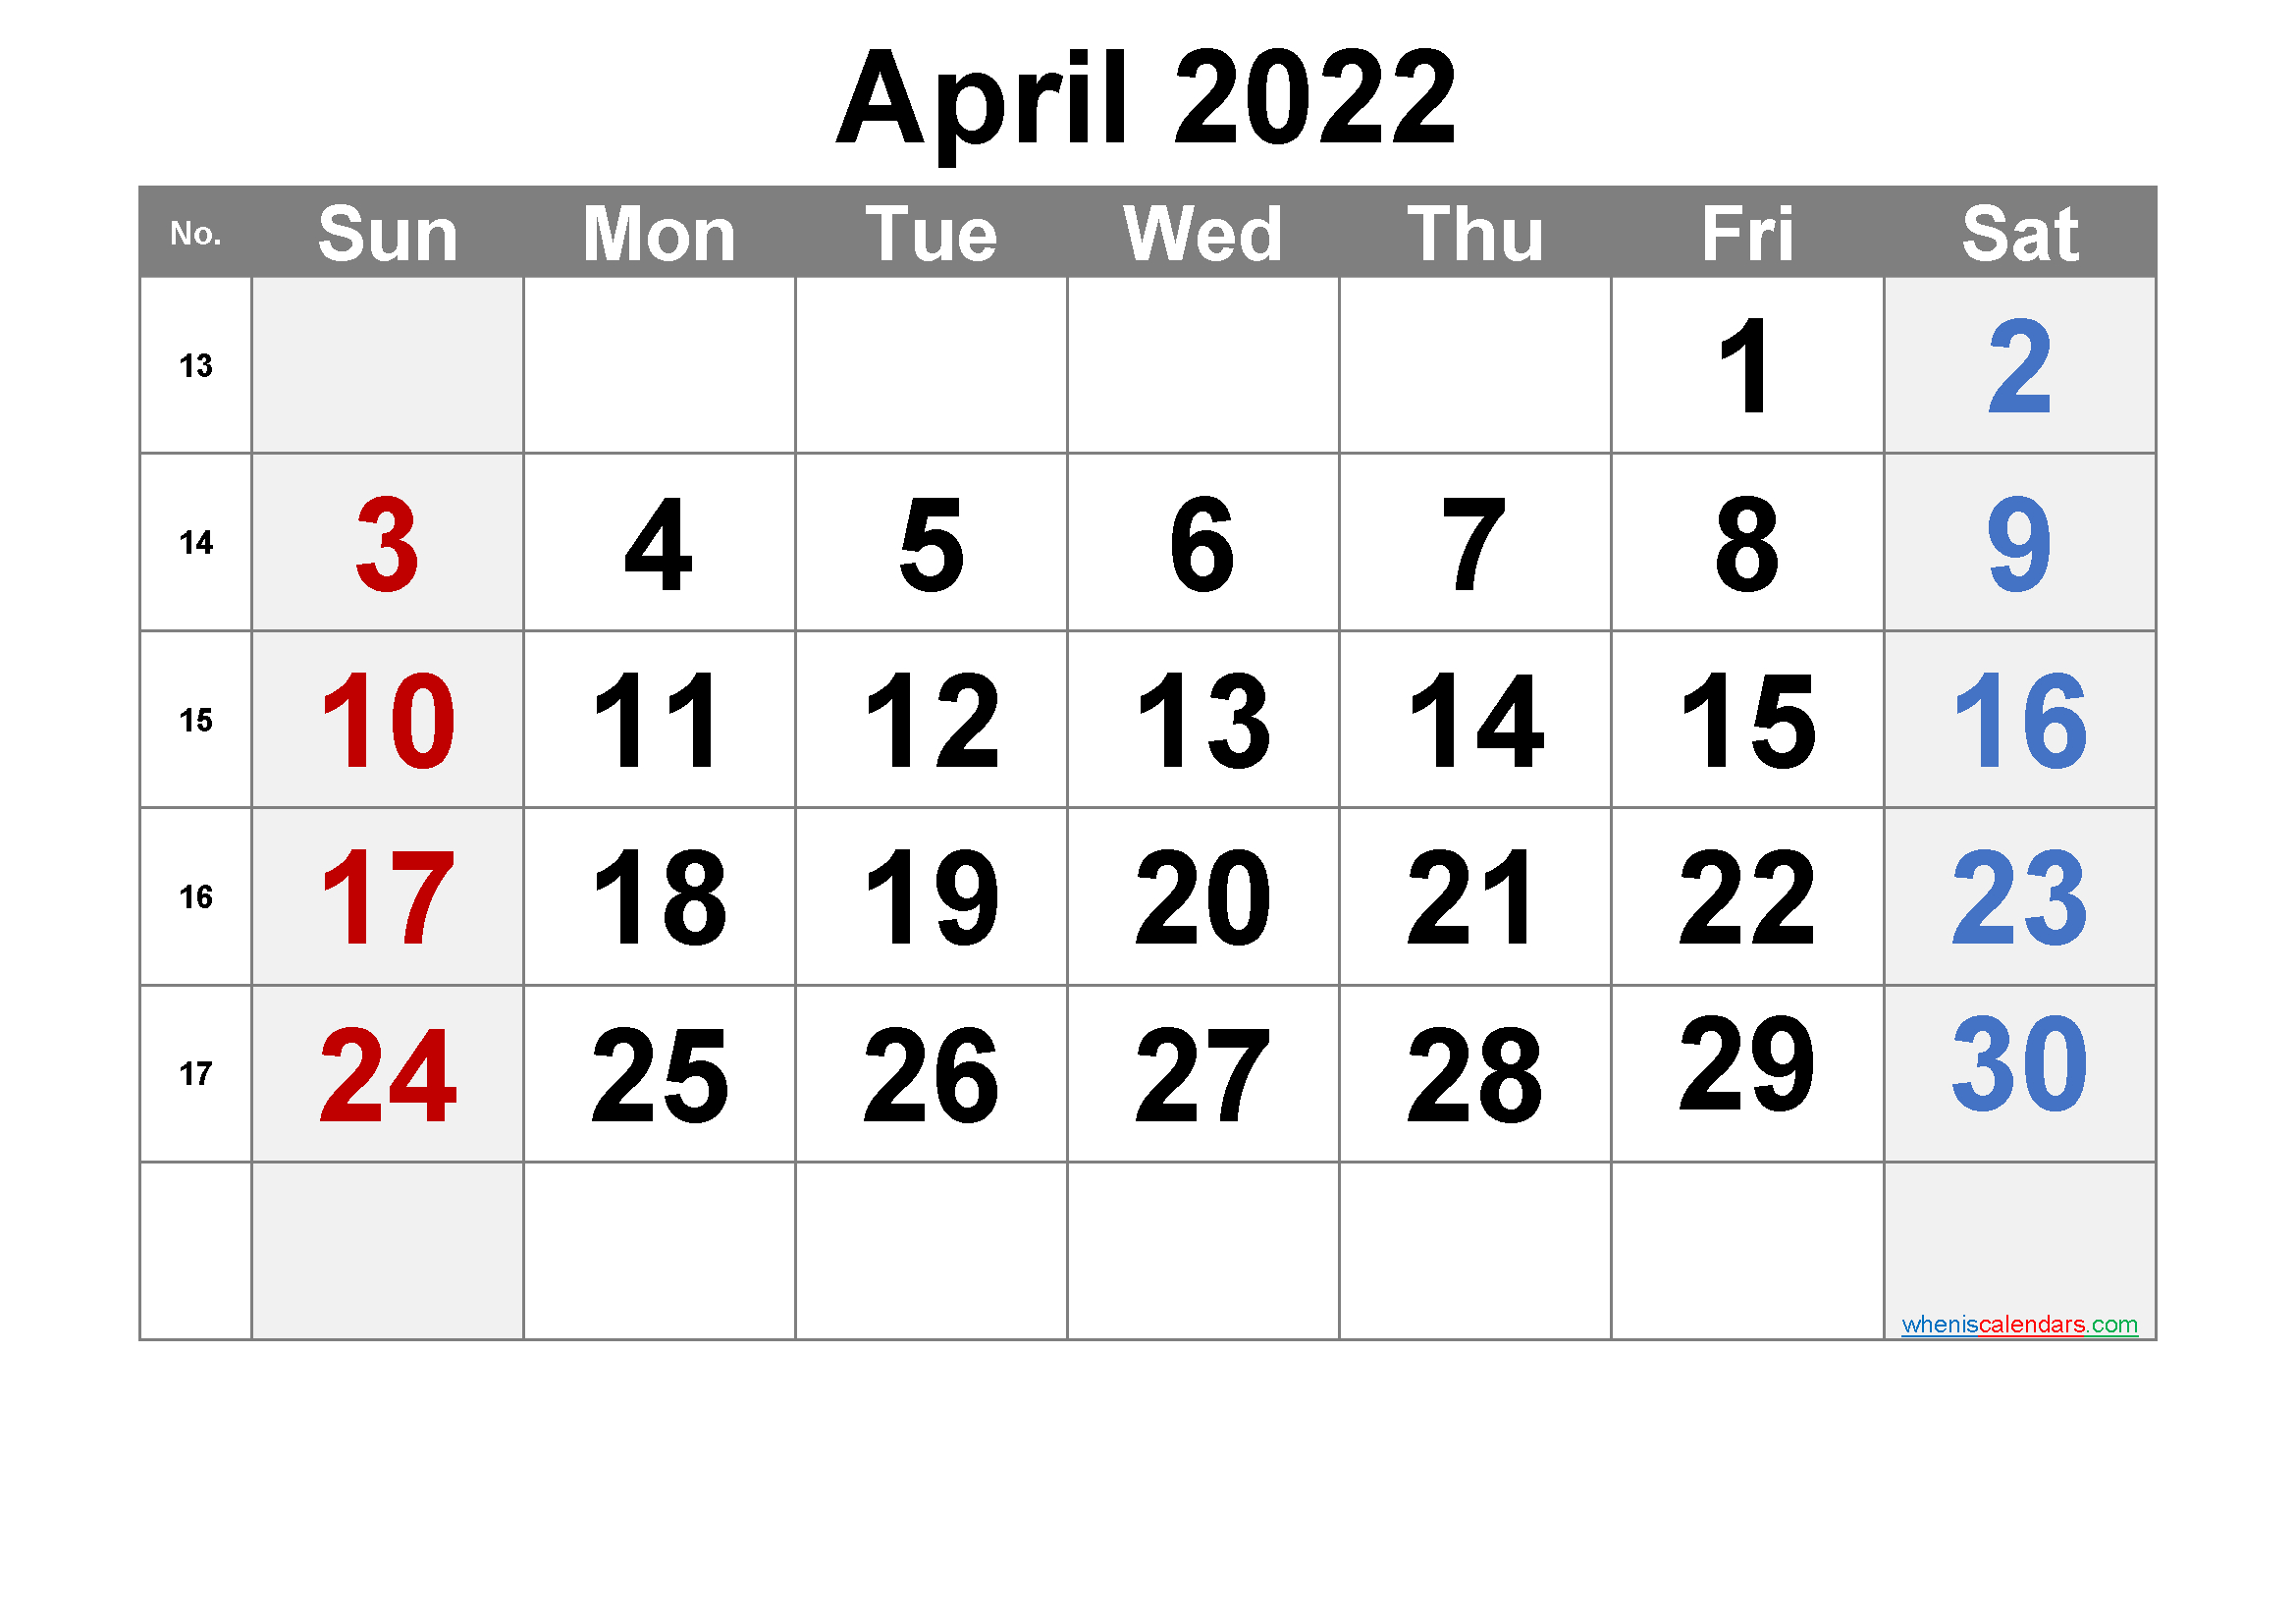 Free April 2022 Calendar With Week Numbers - Free inside April Calendar 2022 Free Printable Graphics